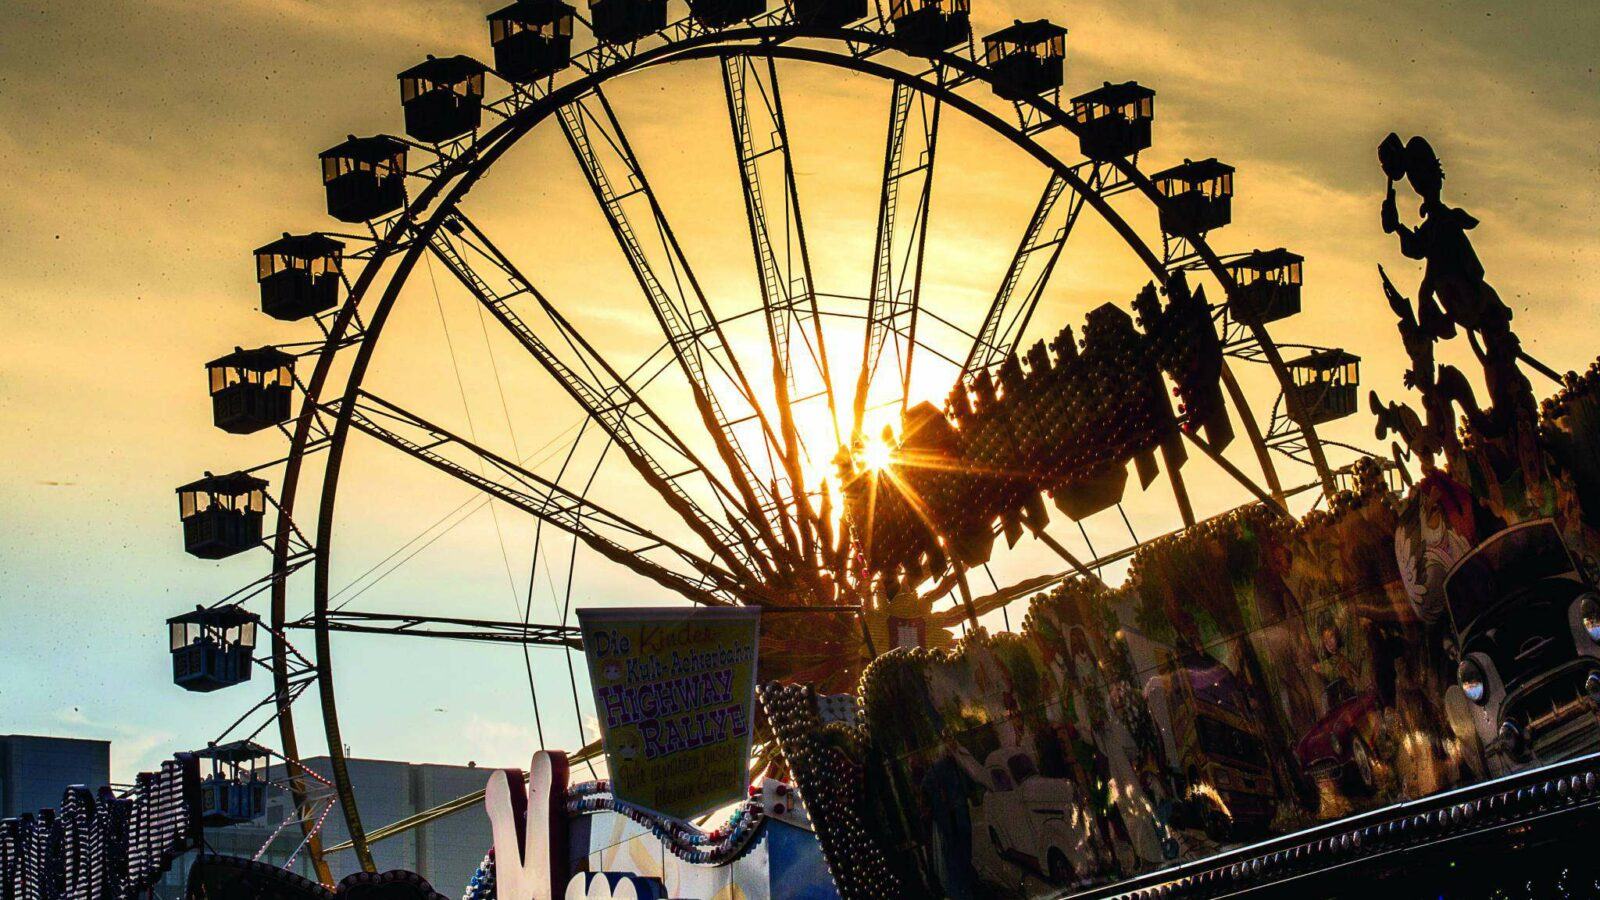 OXMOX-Tipp: Beachclub Sommerdom